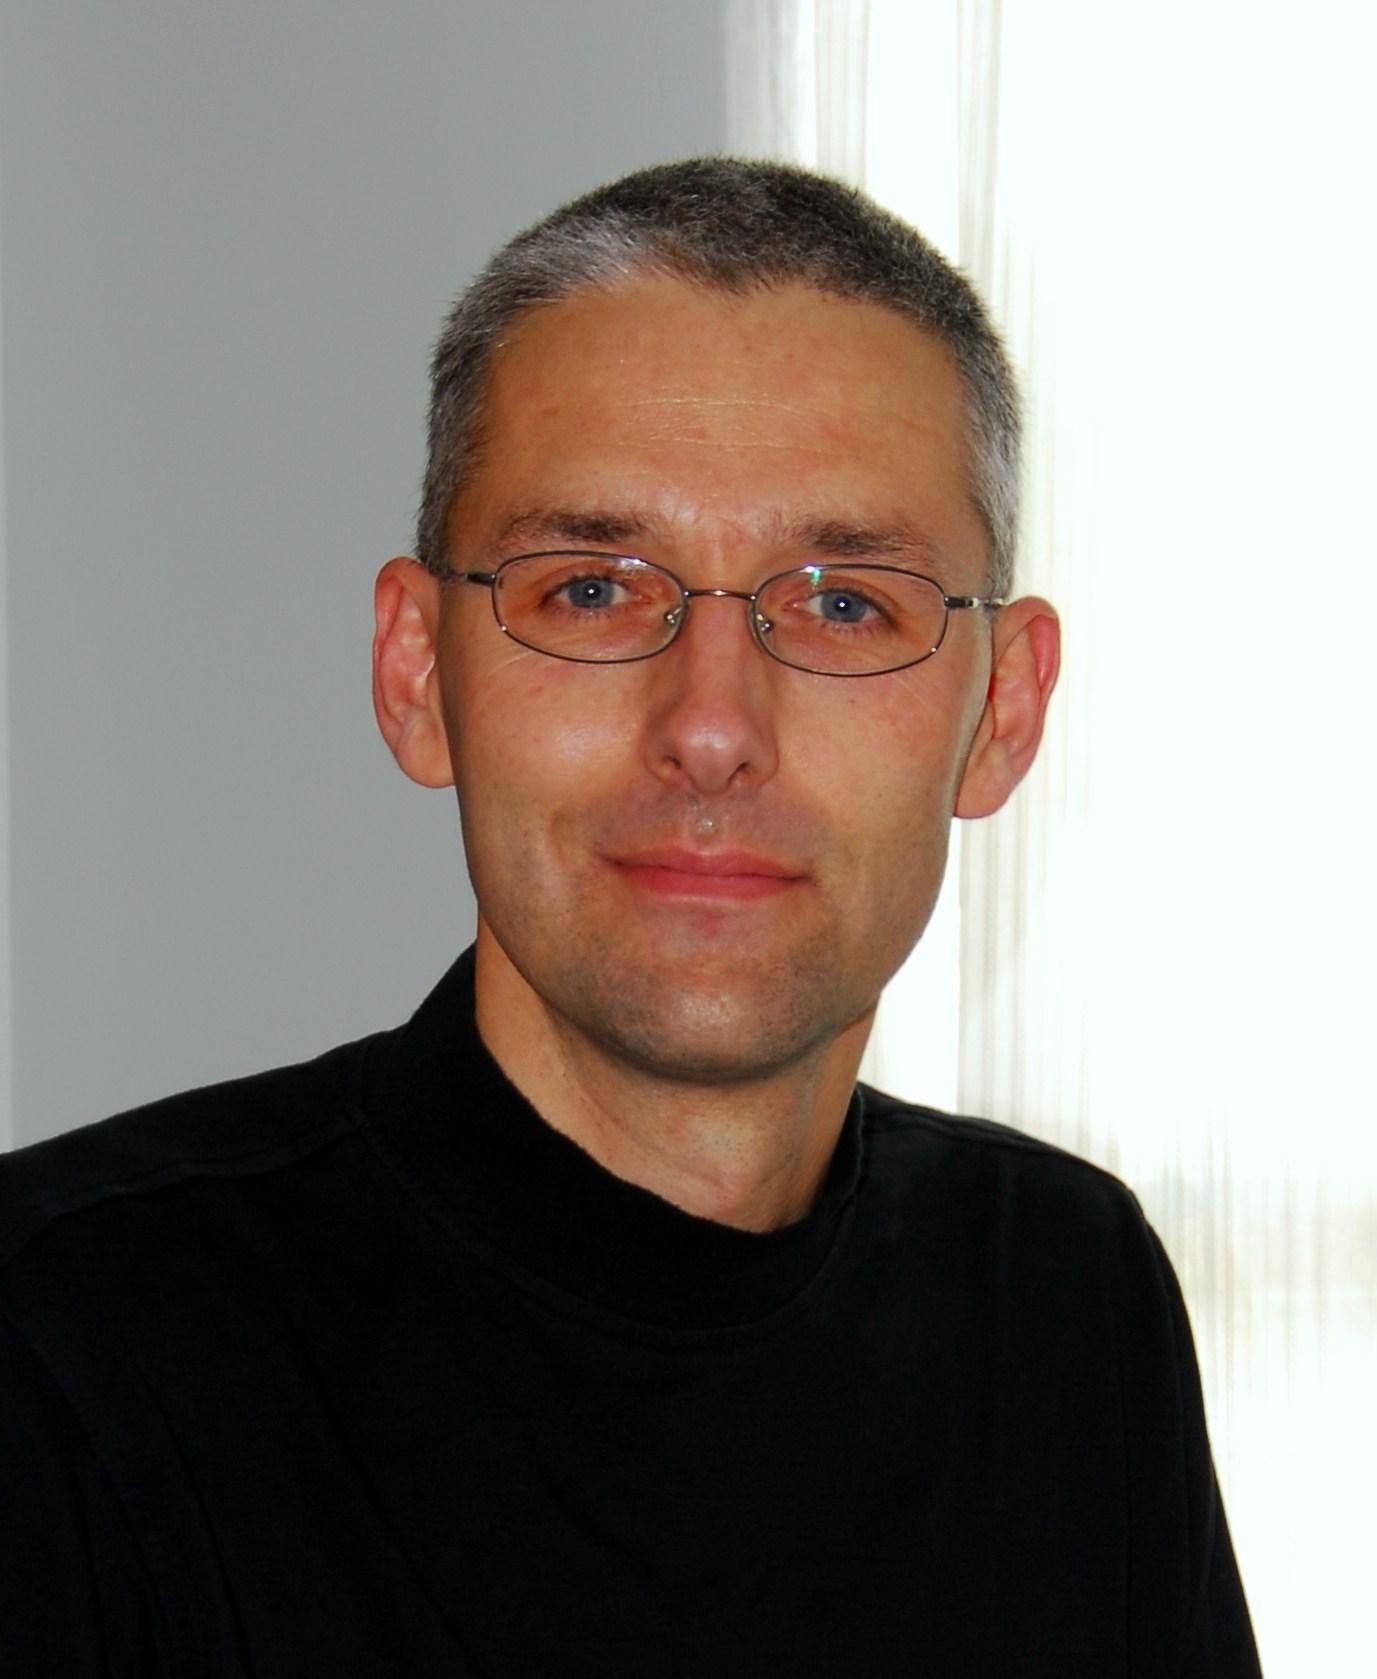 Denis D. Grele